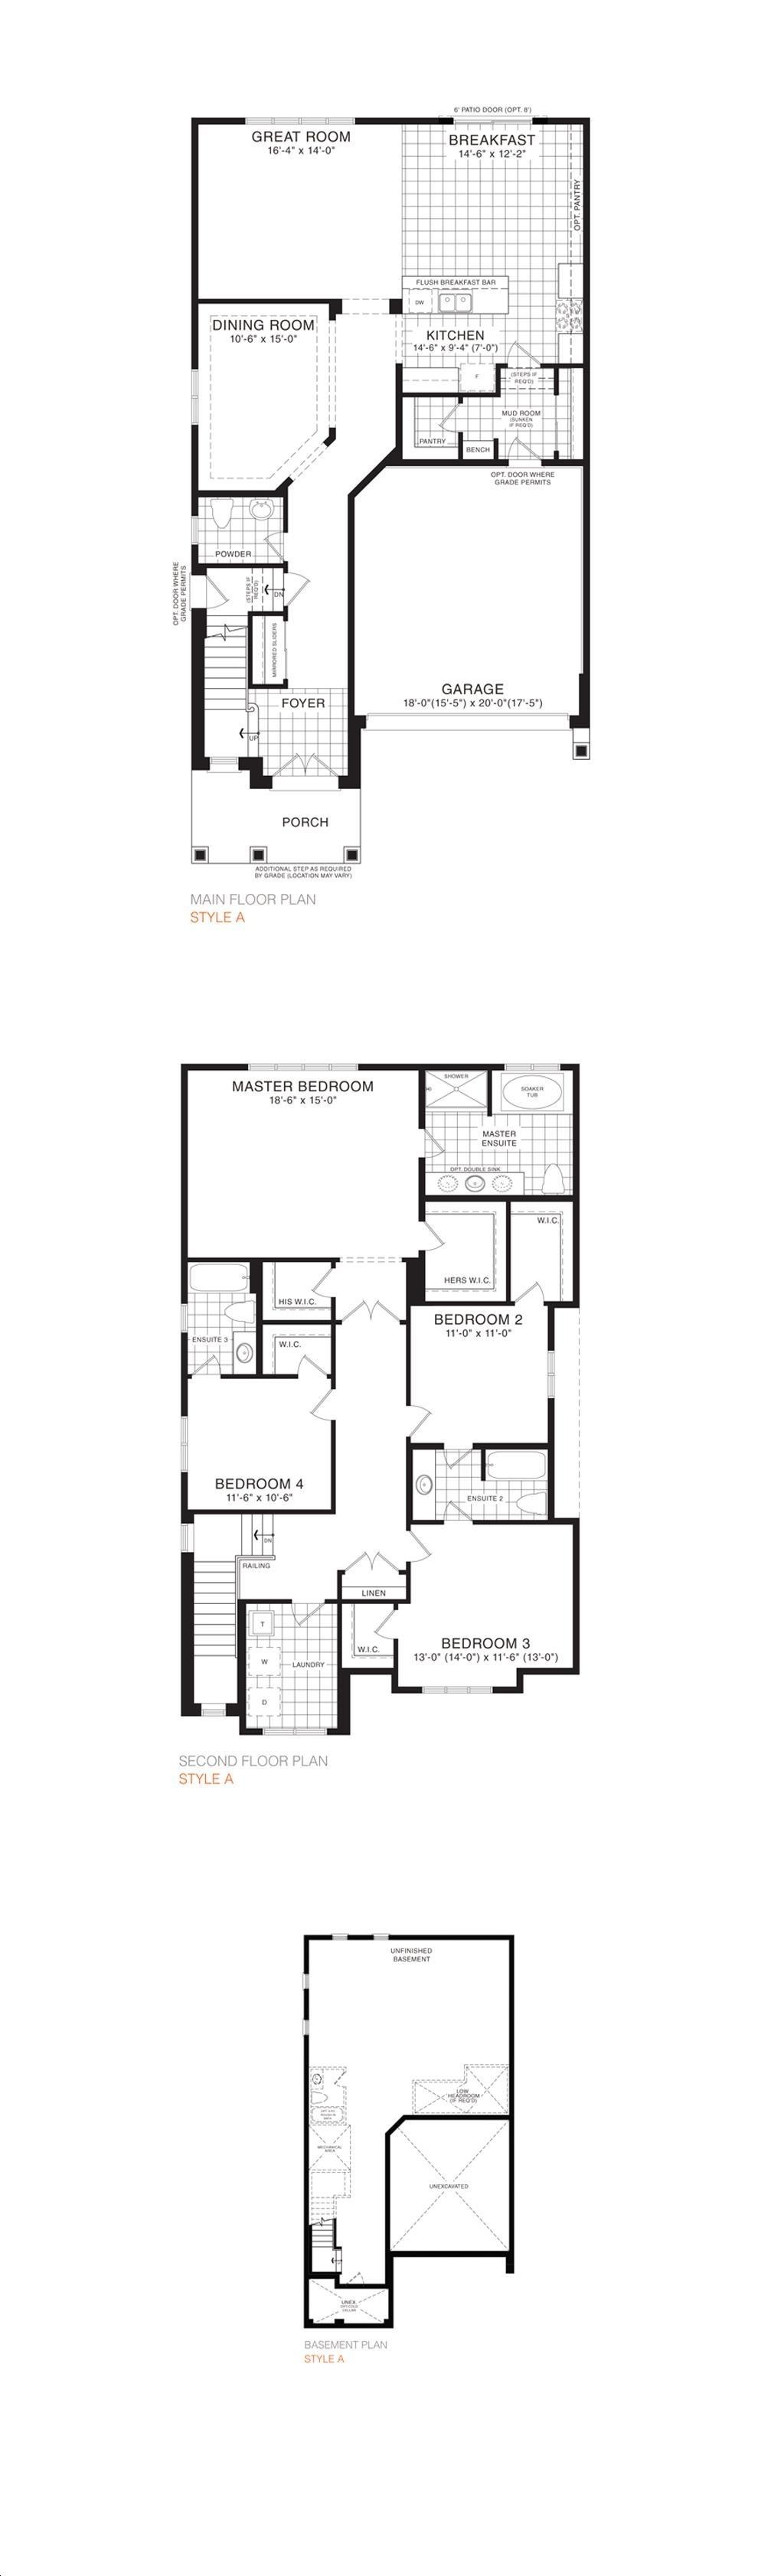 Empire Avalon By Empire Iris 38 Detached Floorplan 4 Bed 2 Bath